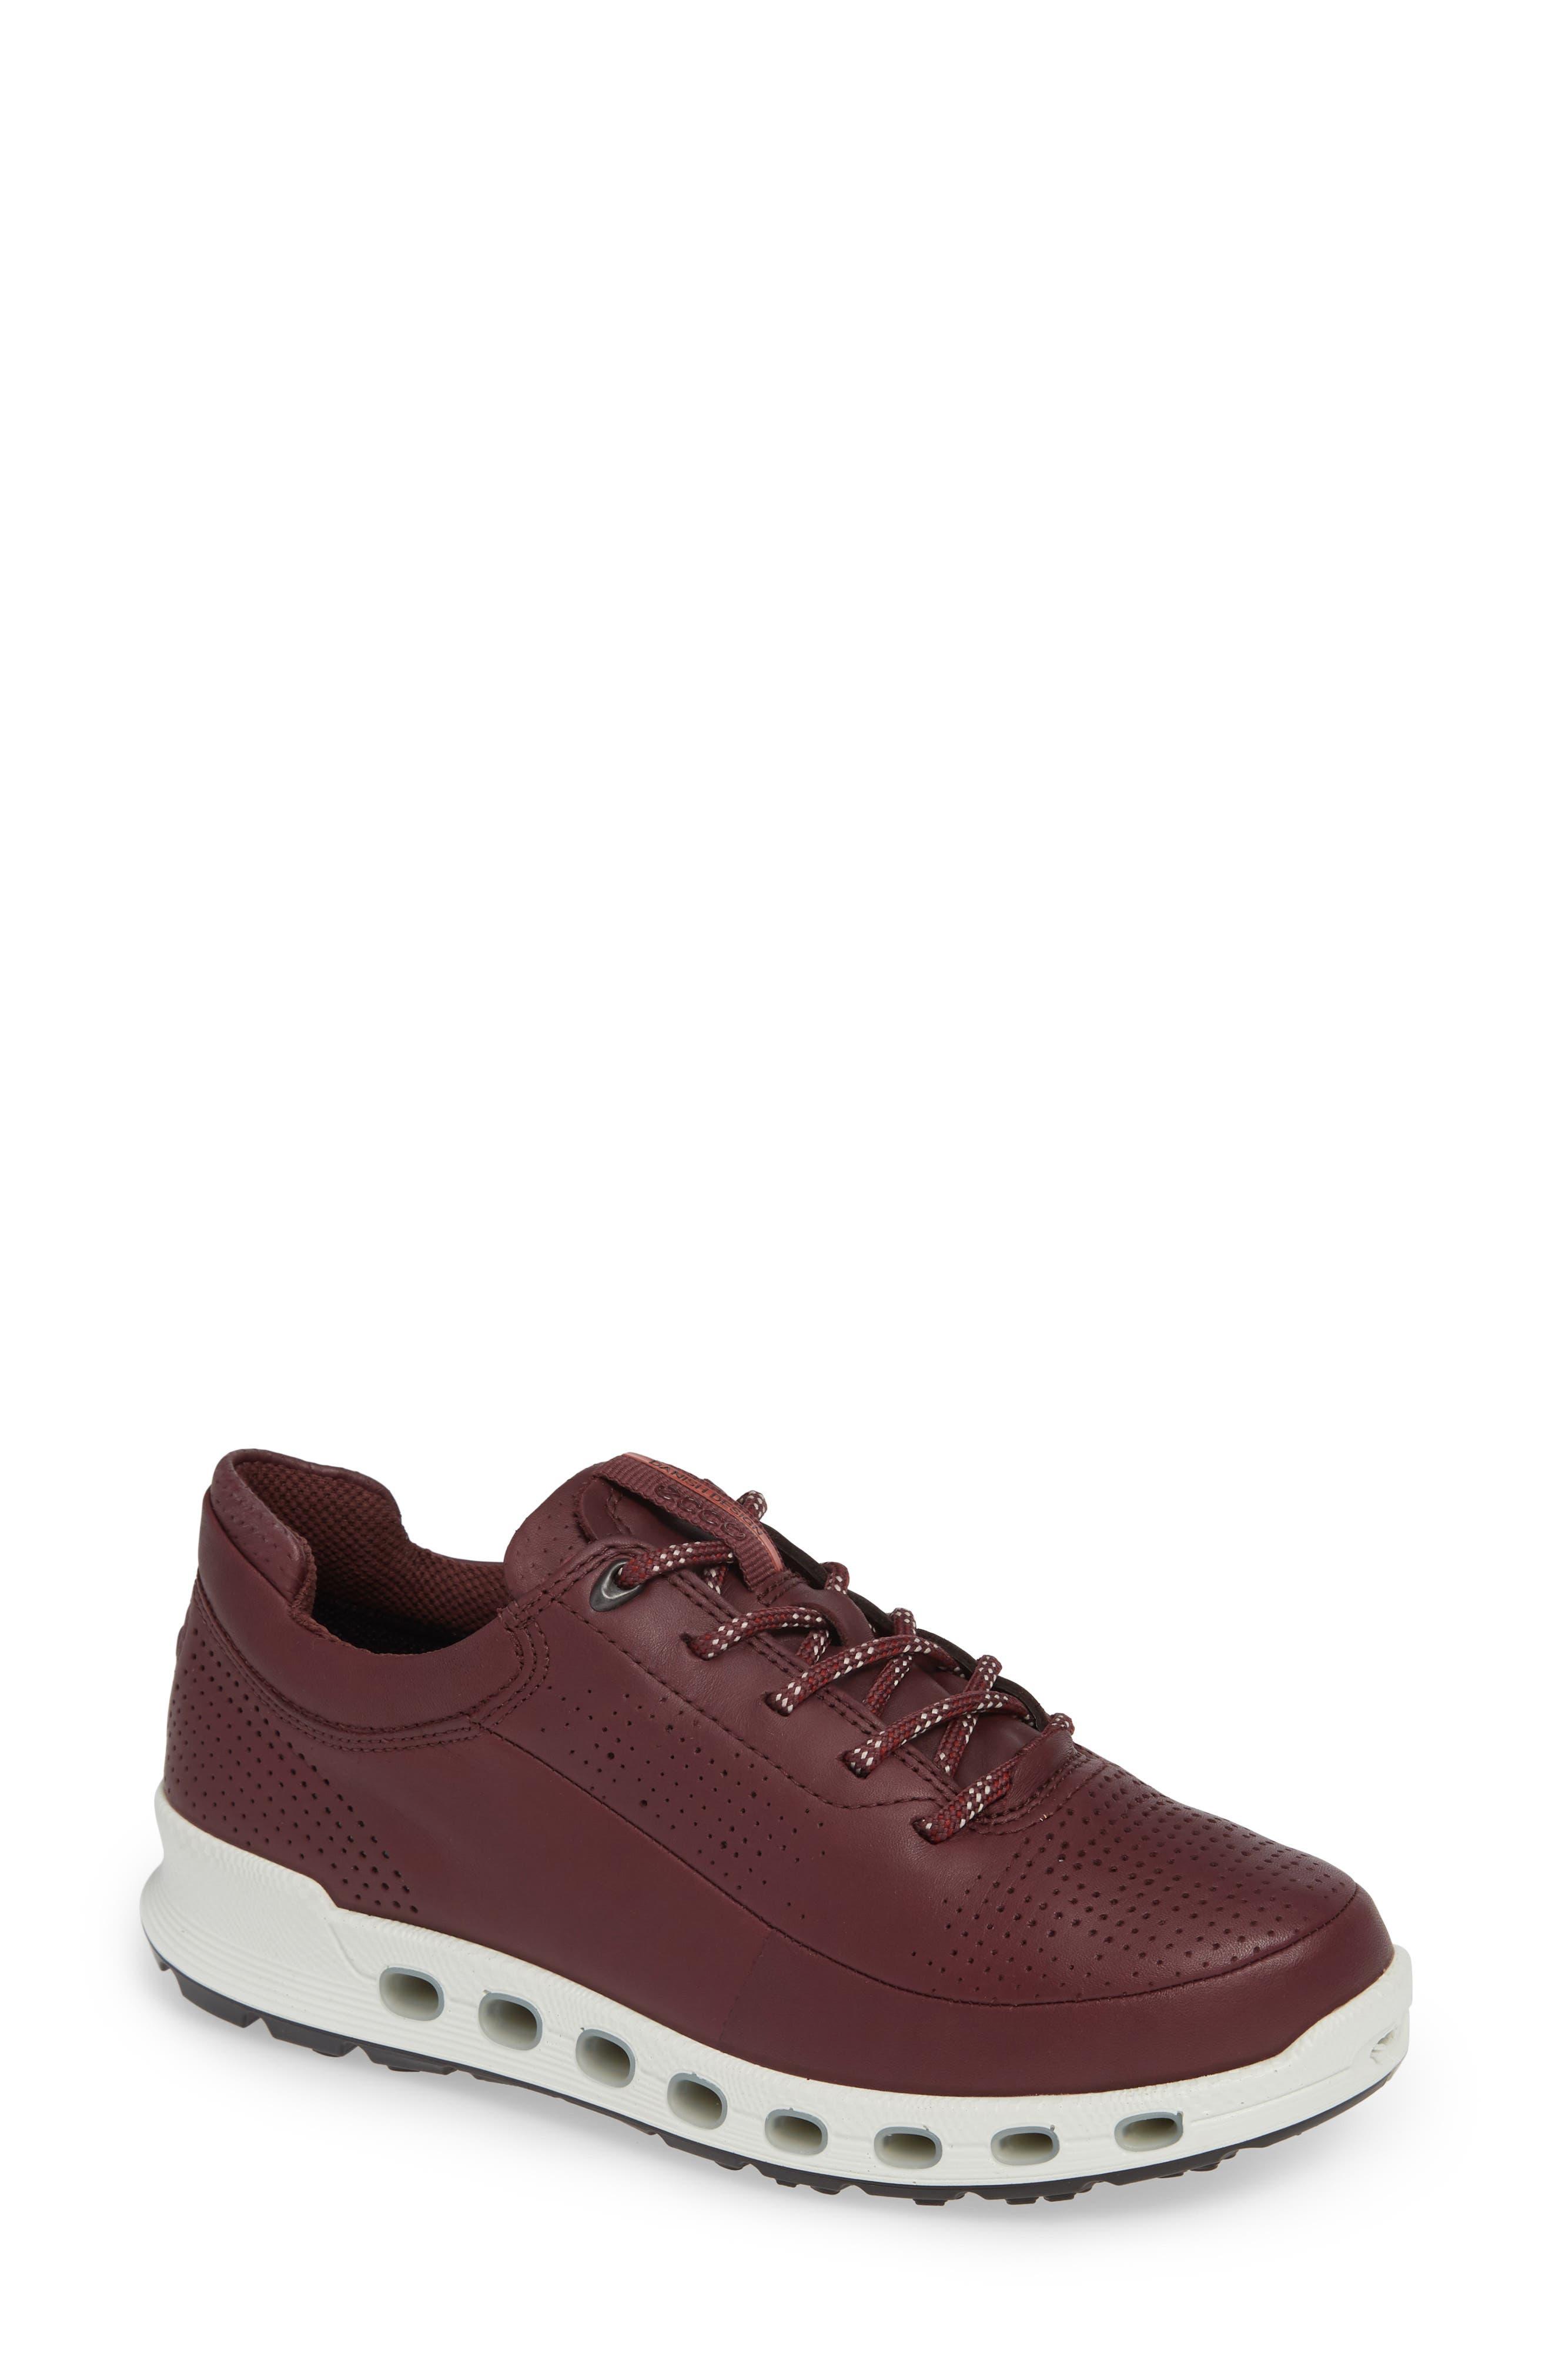 Cool 2.0 GTX Waterproof Sneaker,                         Main,                         color, WINE LEATHER